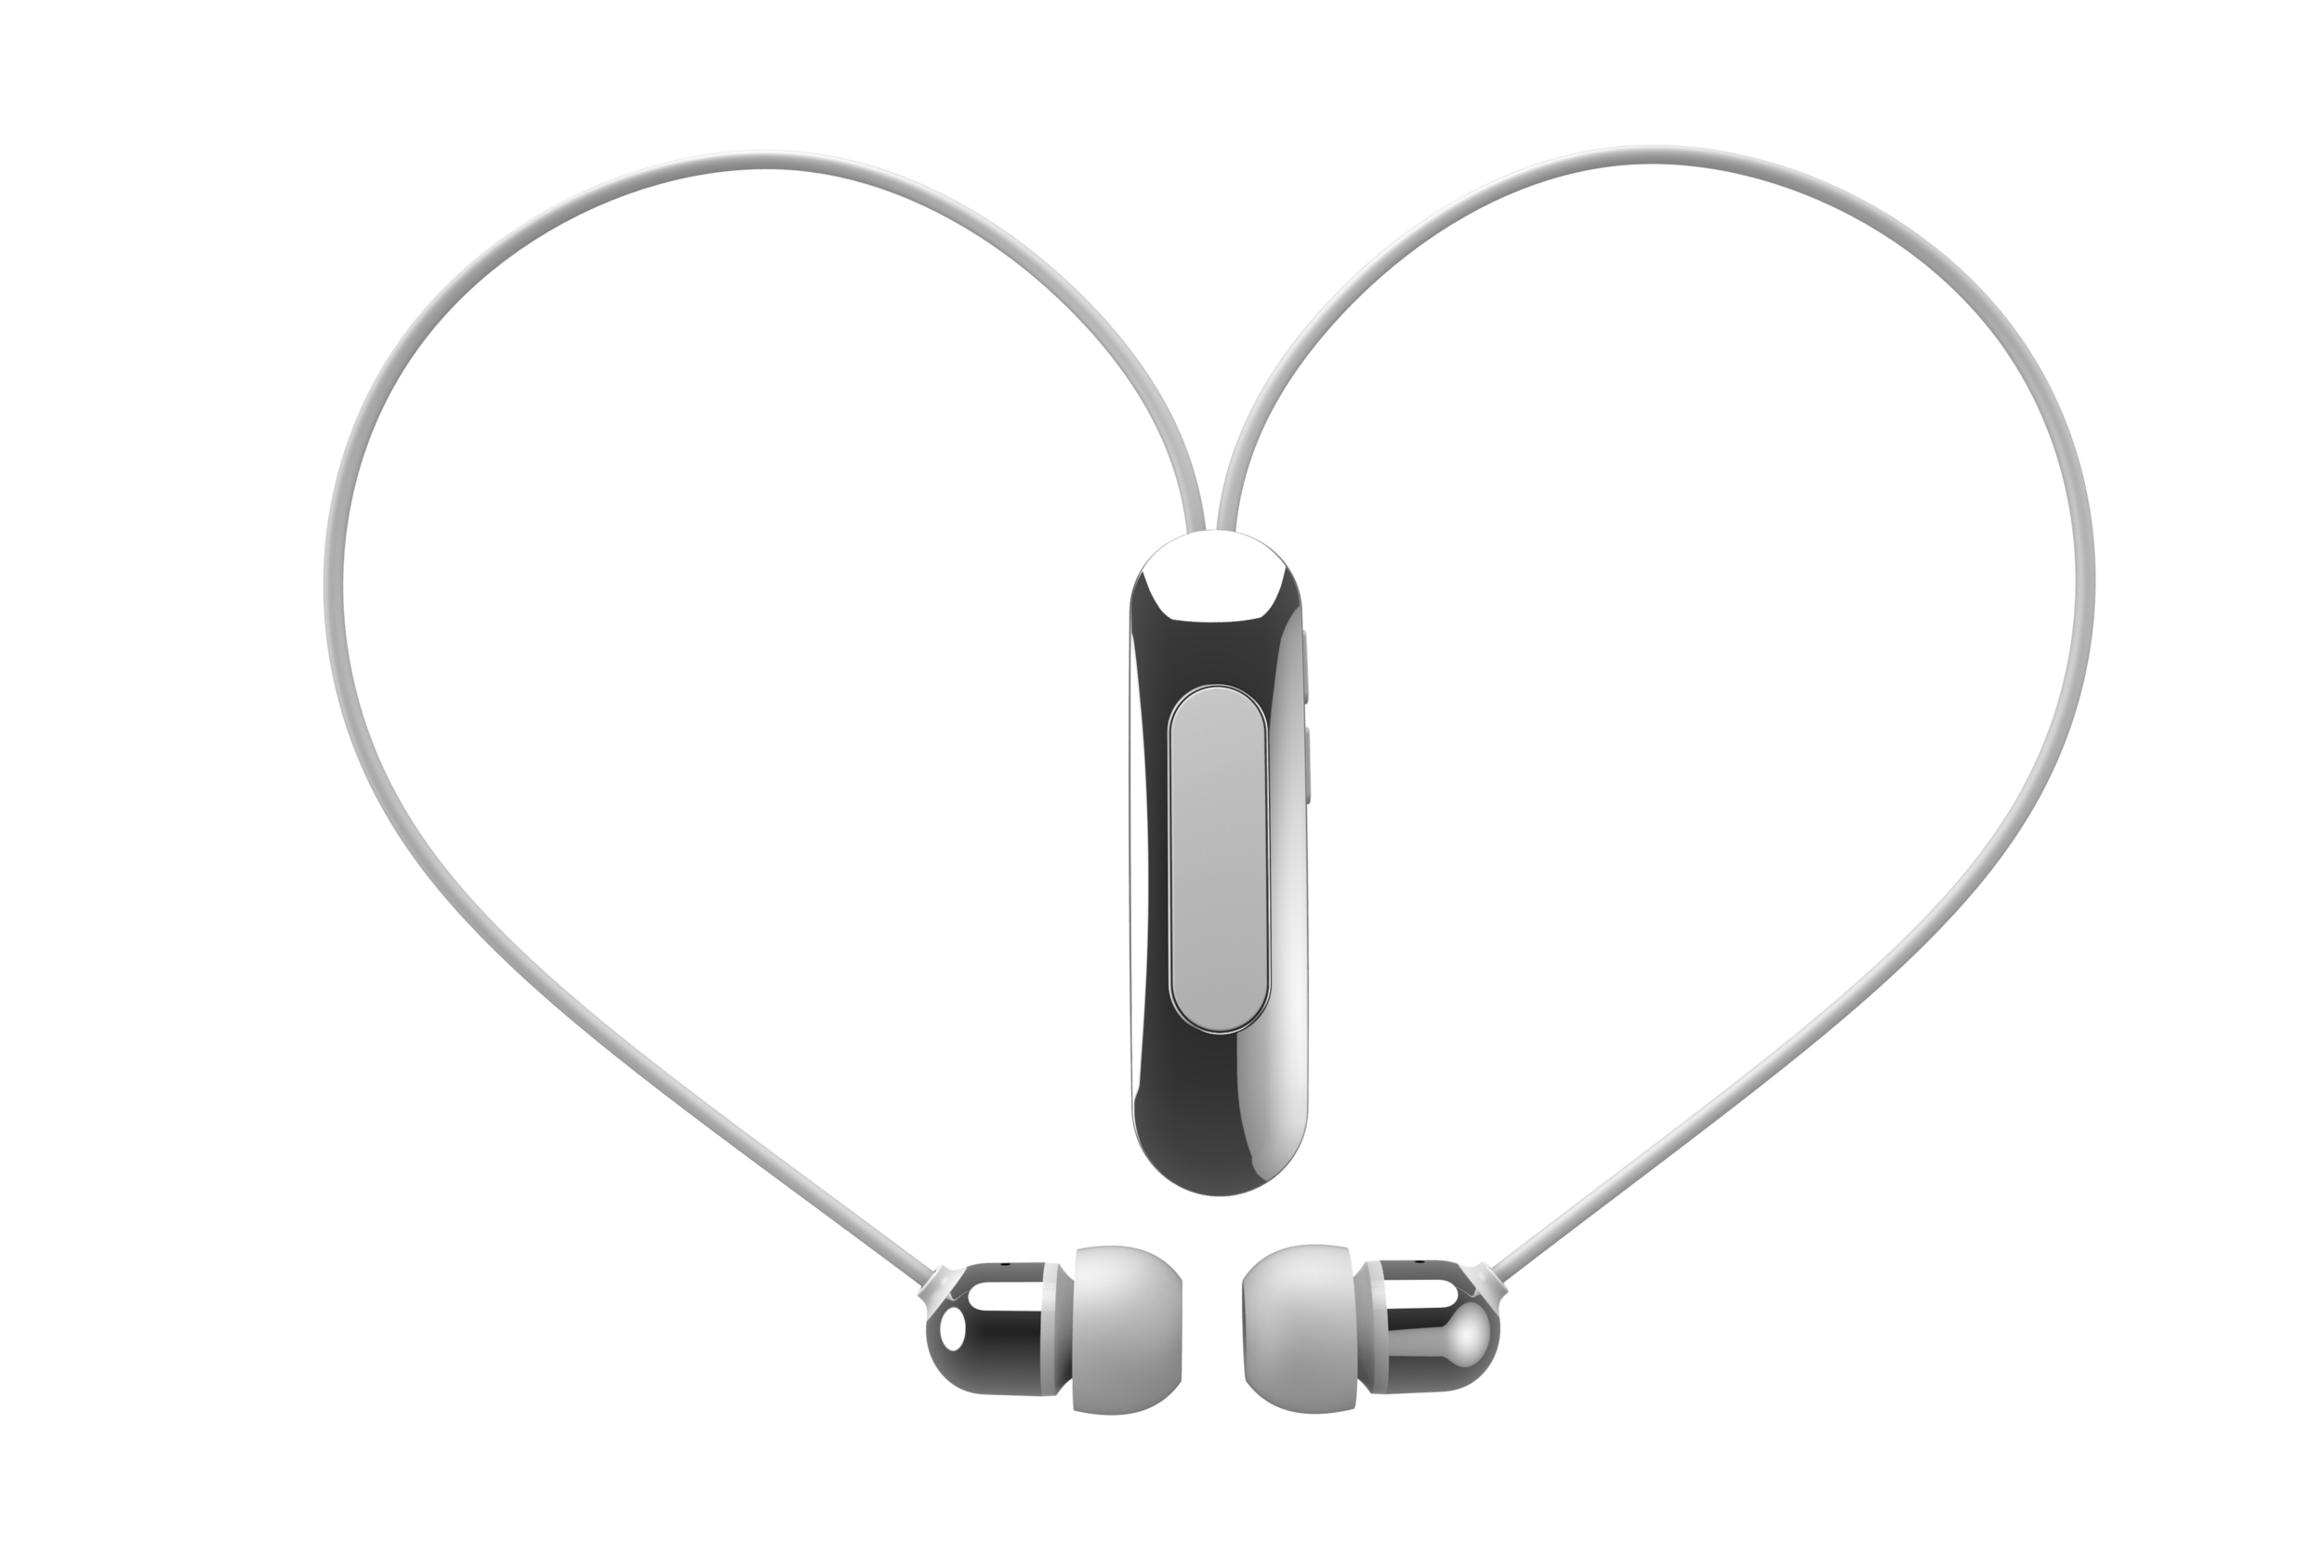 helix-headset-whitesilver-3.png